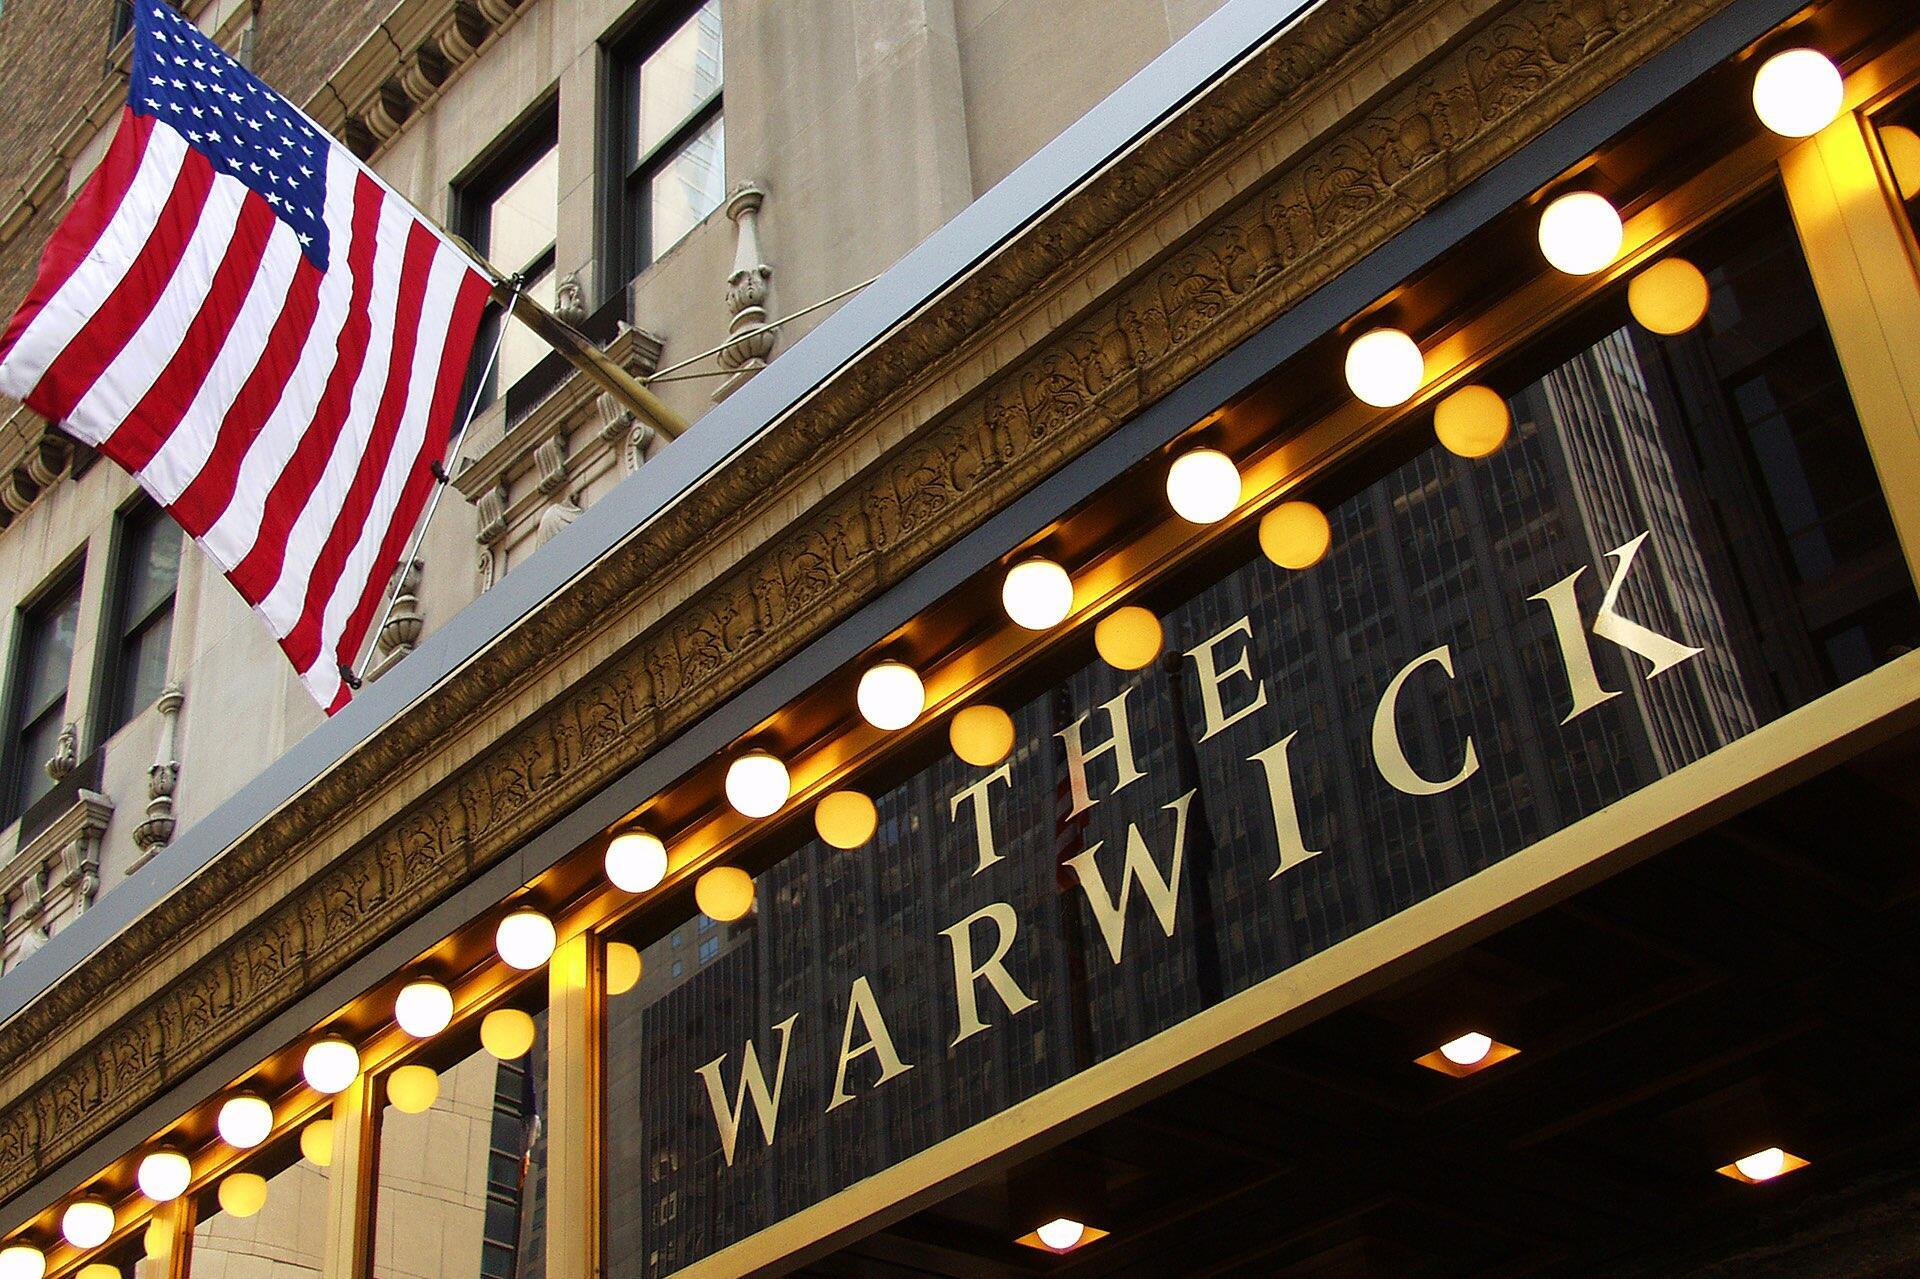 Warwick New York Facade